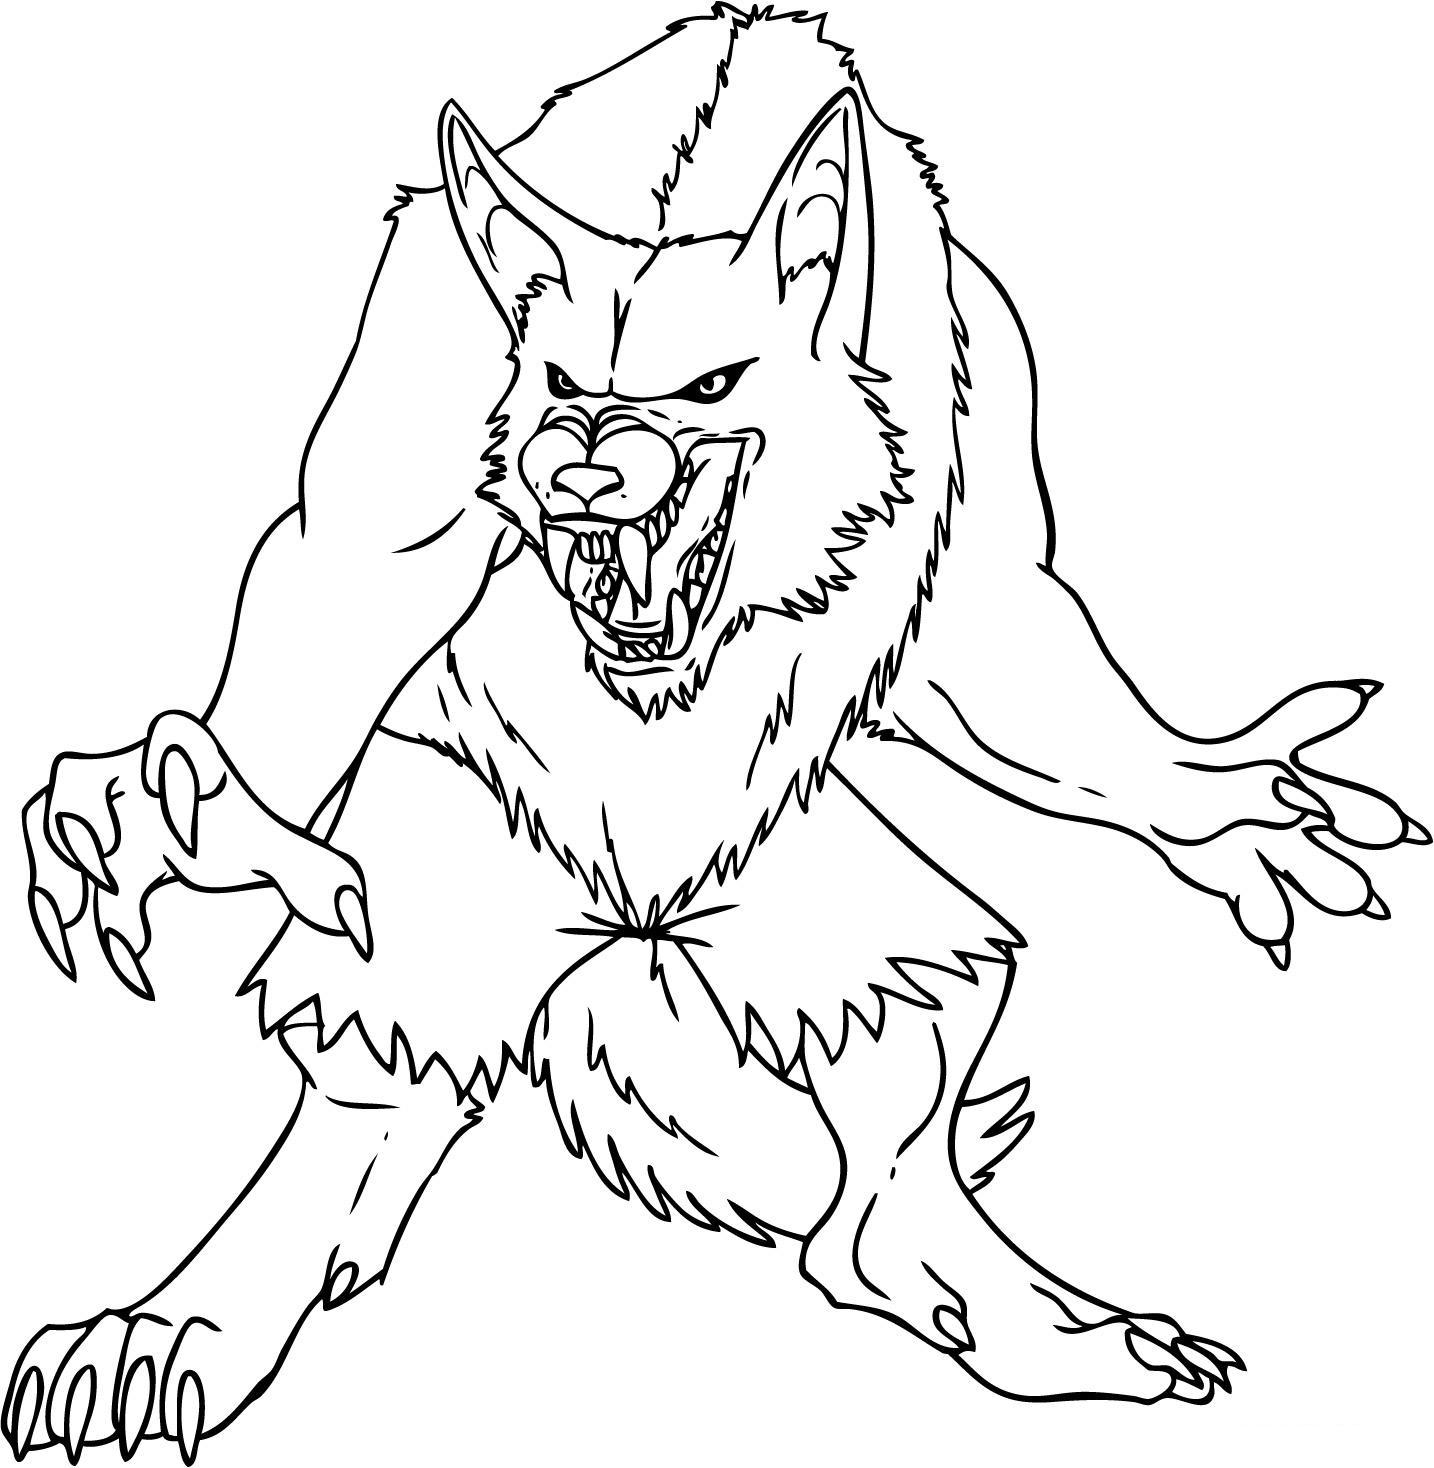 werewolf coloring pages werewolf coloring pages kids coloring pages free werewolf coloring pages